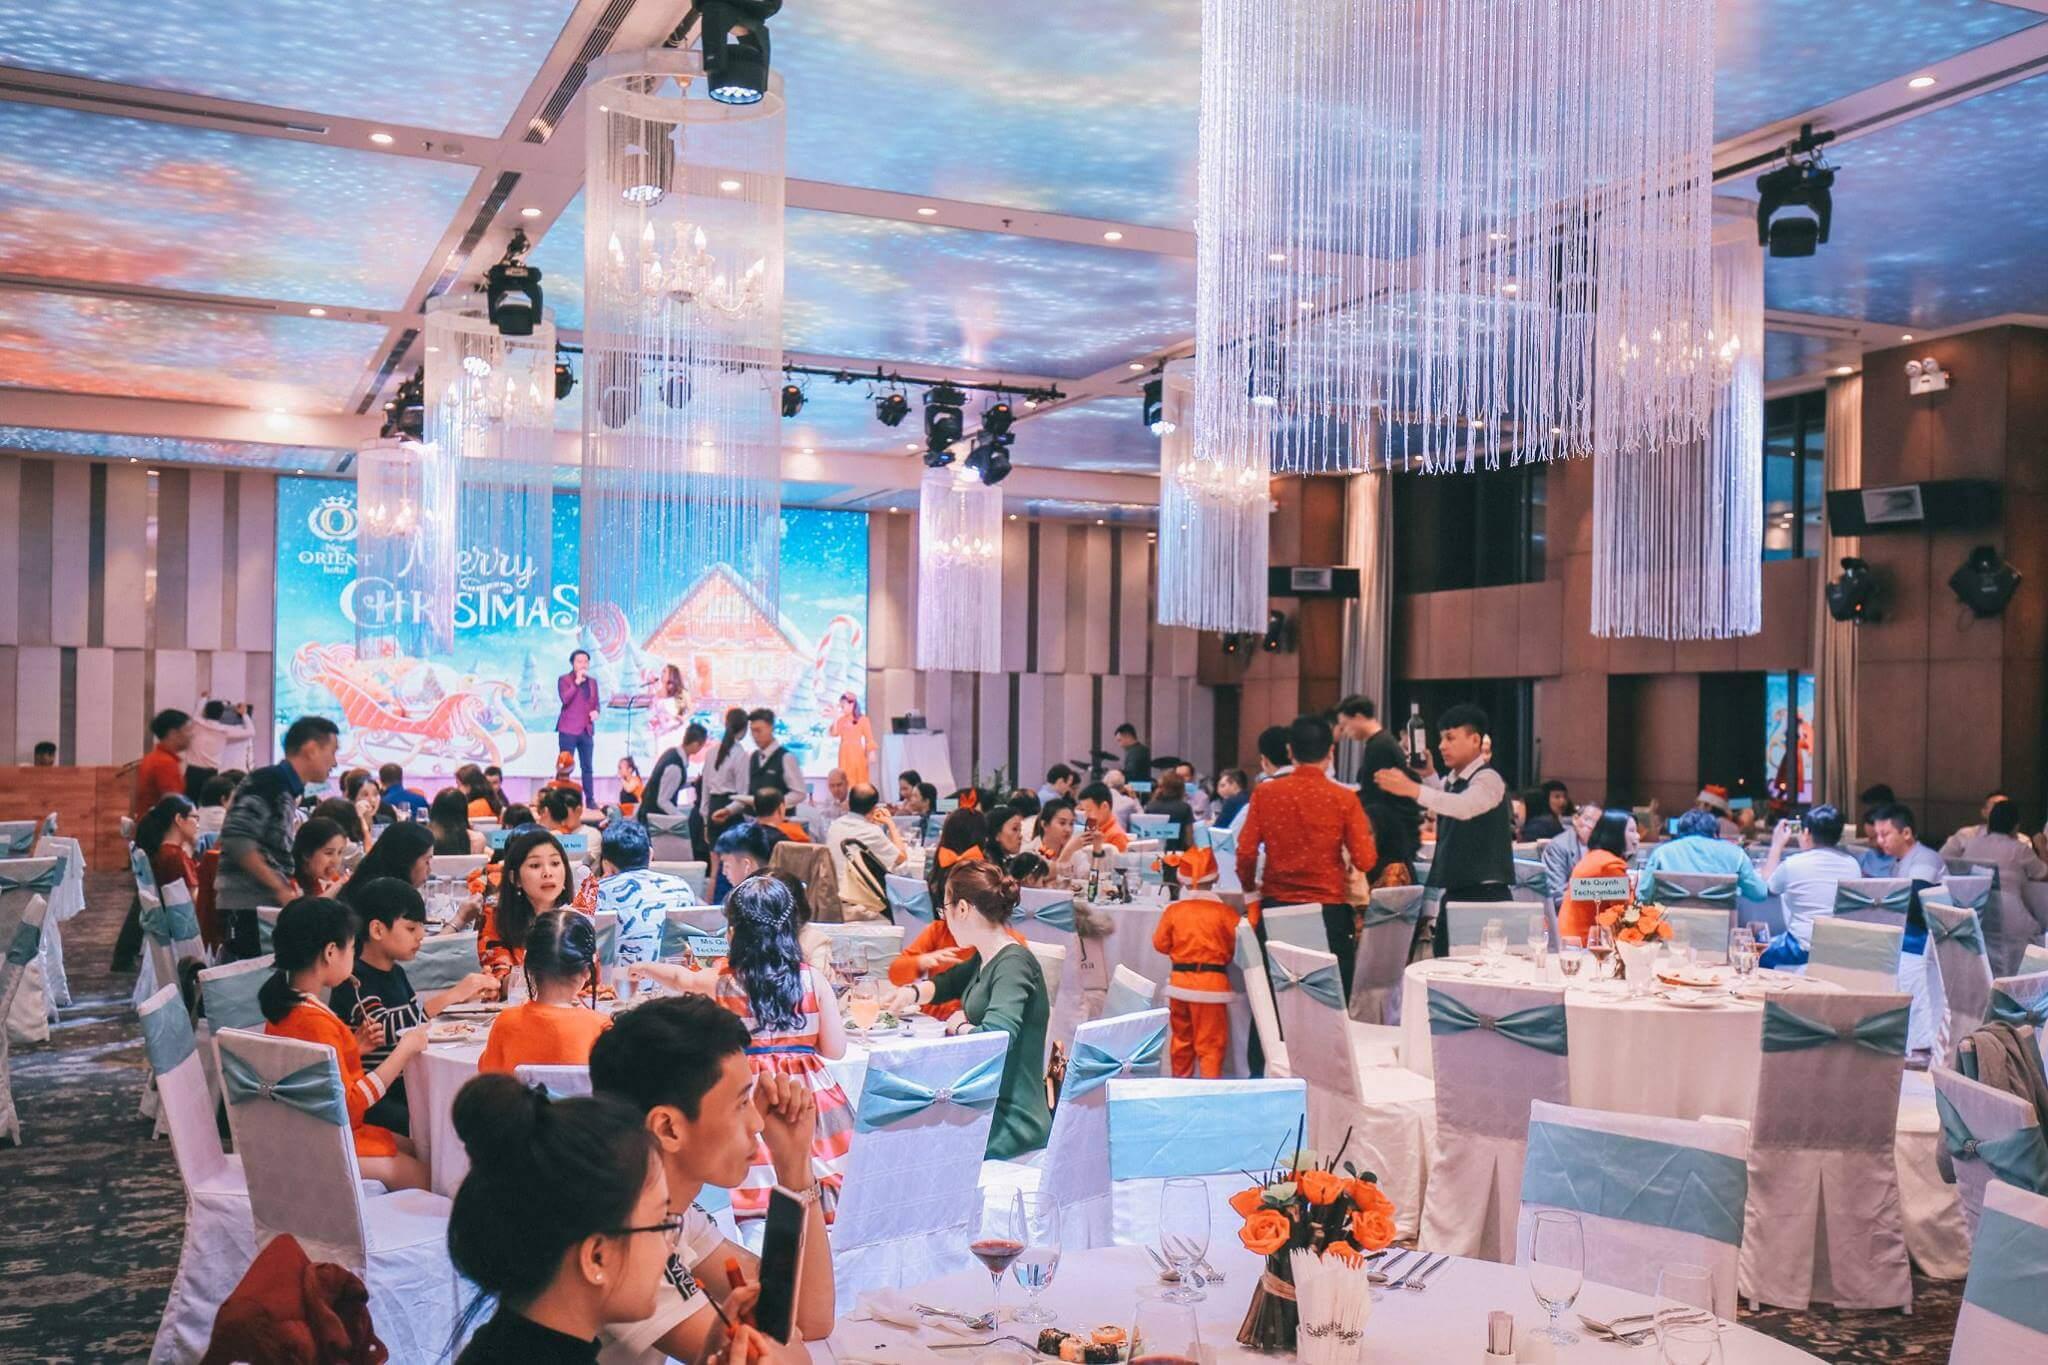 Tiec Don Giang Sinh Nam Moi Tai New Orient Hotel Danang Fantasticity Com 08